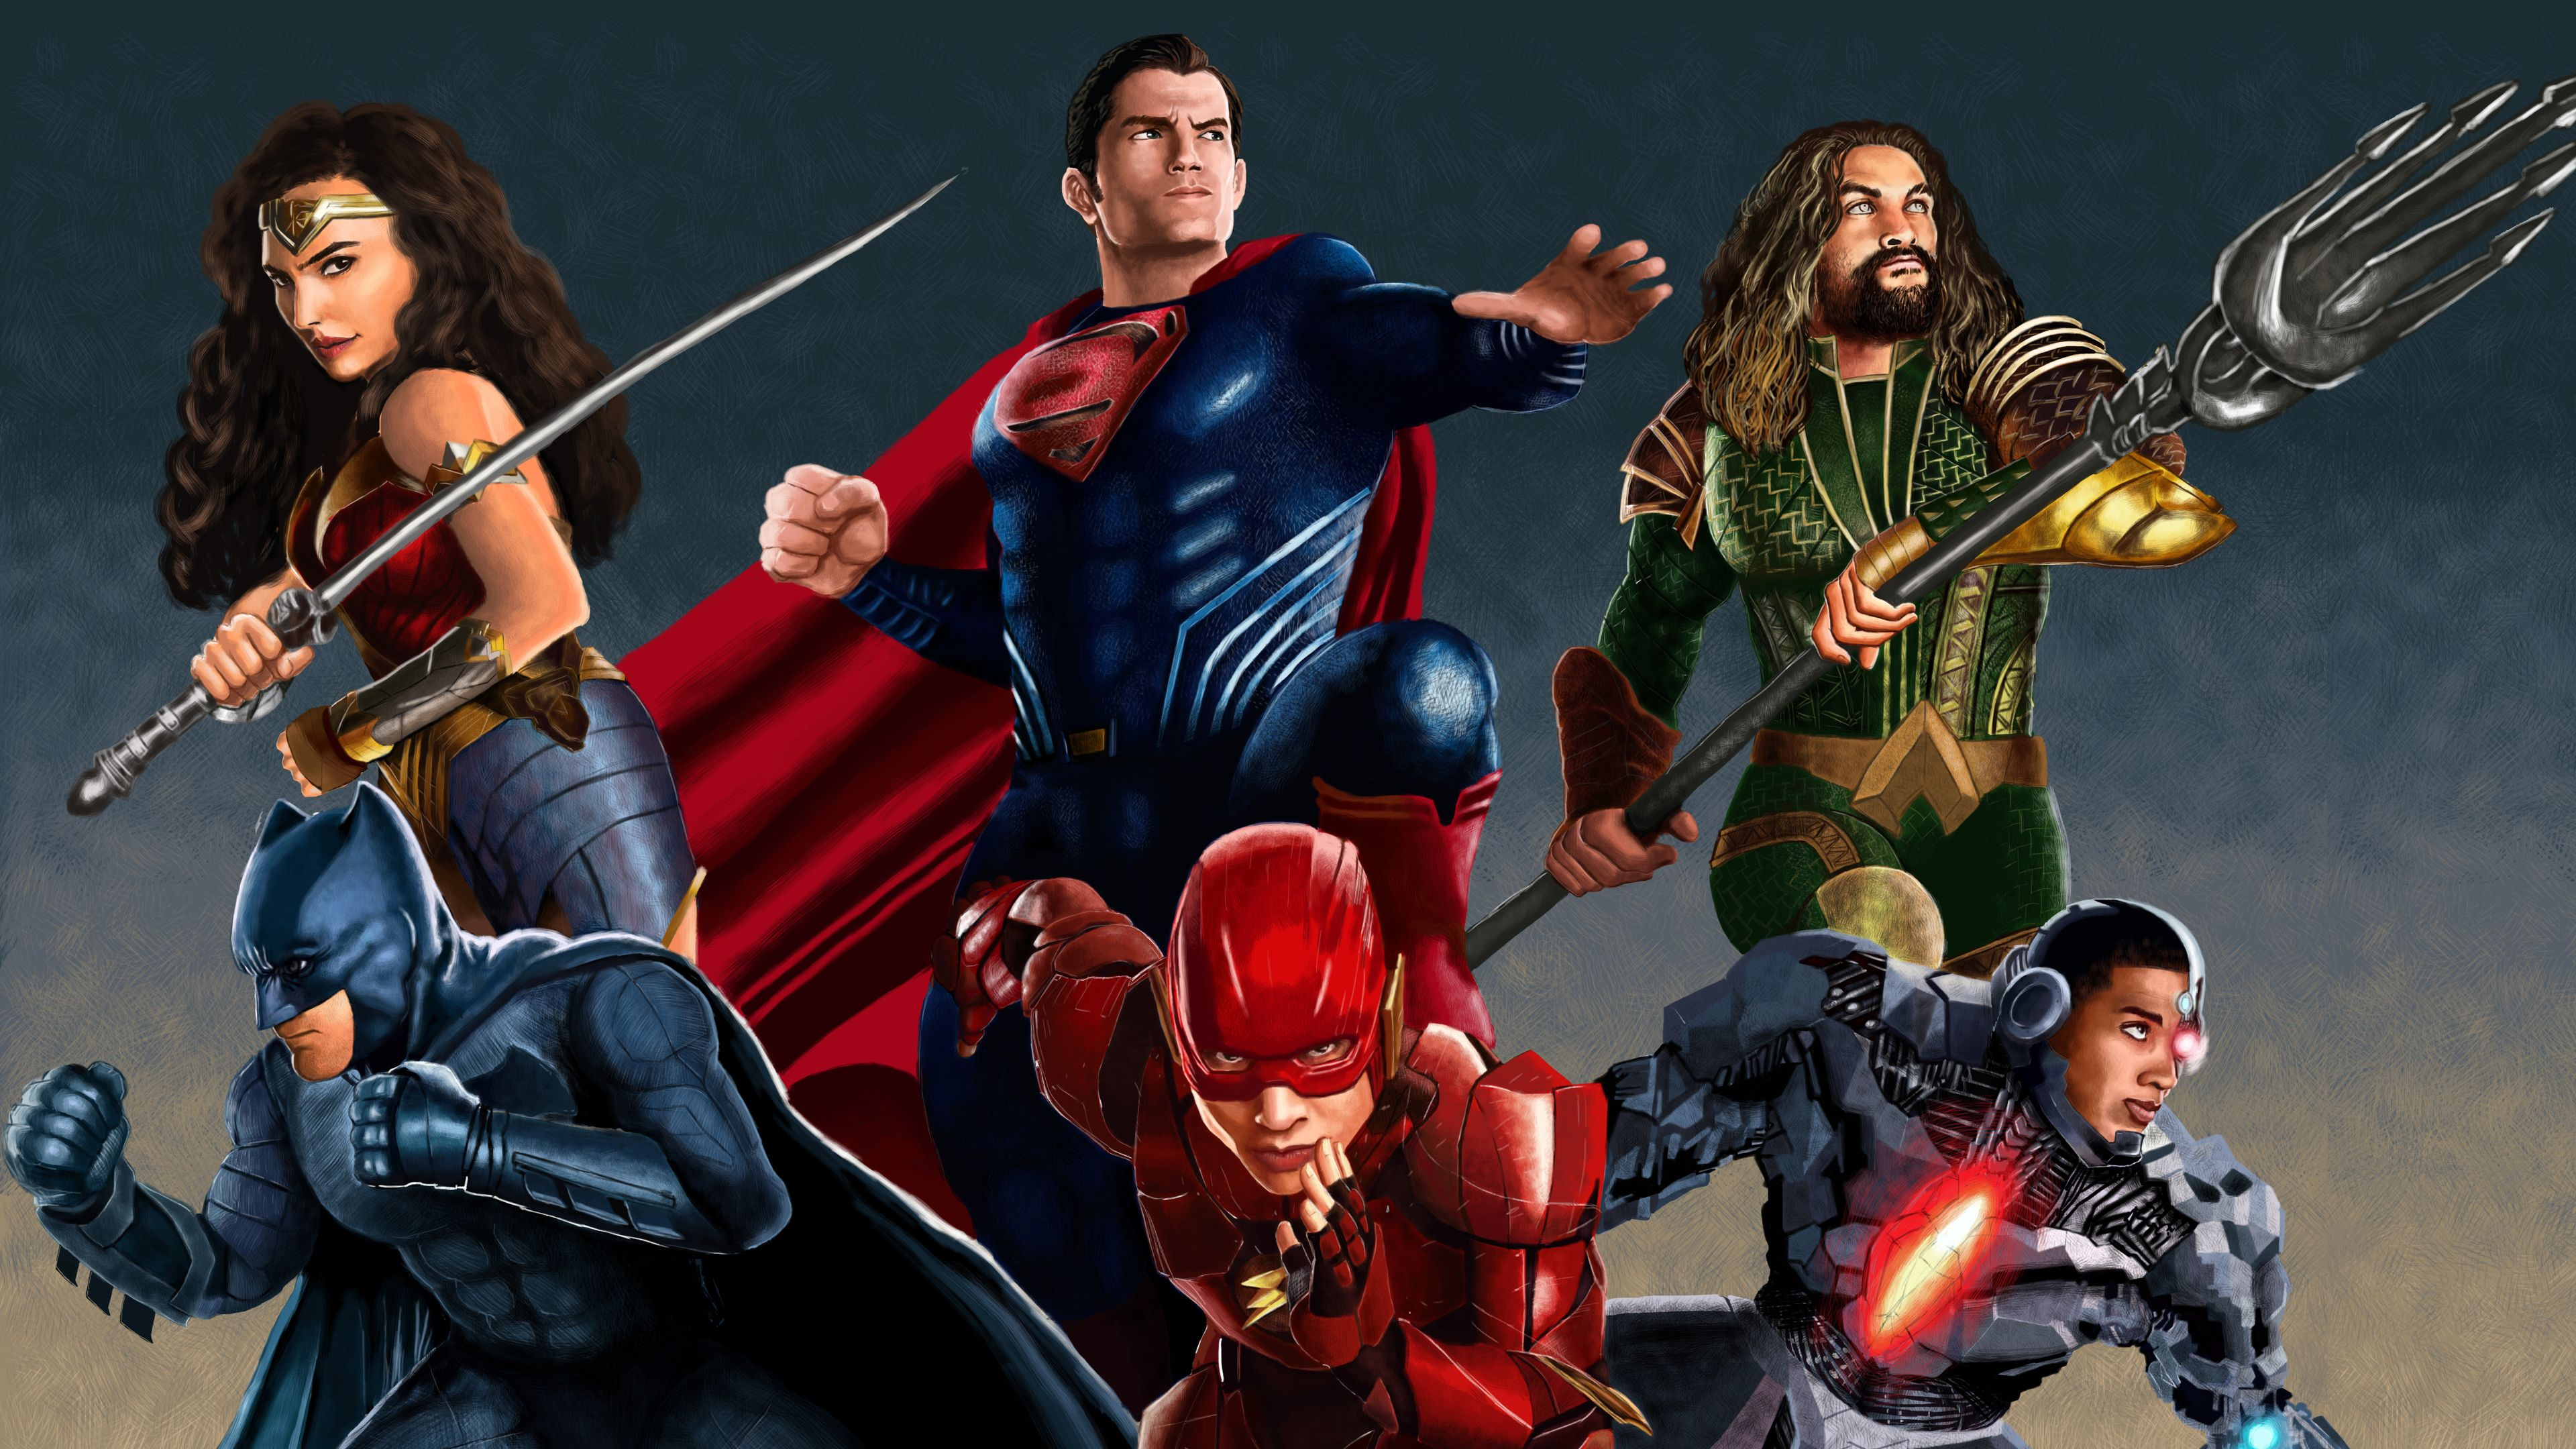 Justice League Artworks 4k Superheroes Wallpapers Justice League Wallpapers Hd Wallpapers Digit Justice League Artwork Superhero Justice League Hd Wallpaper